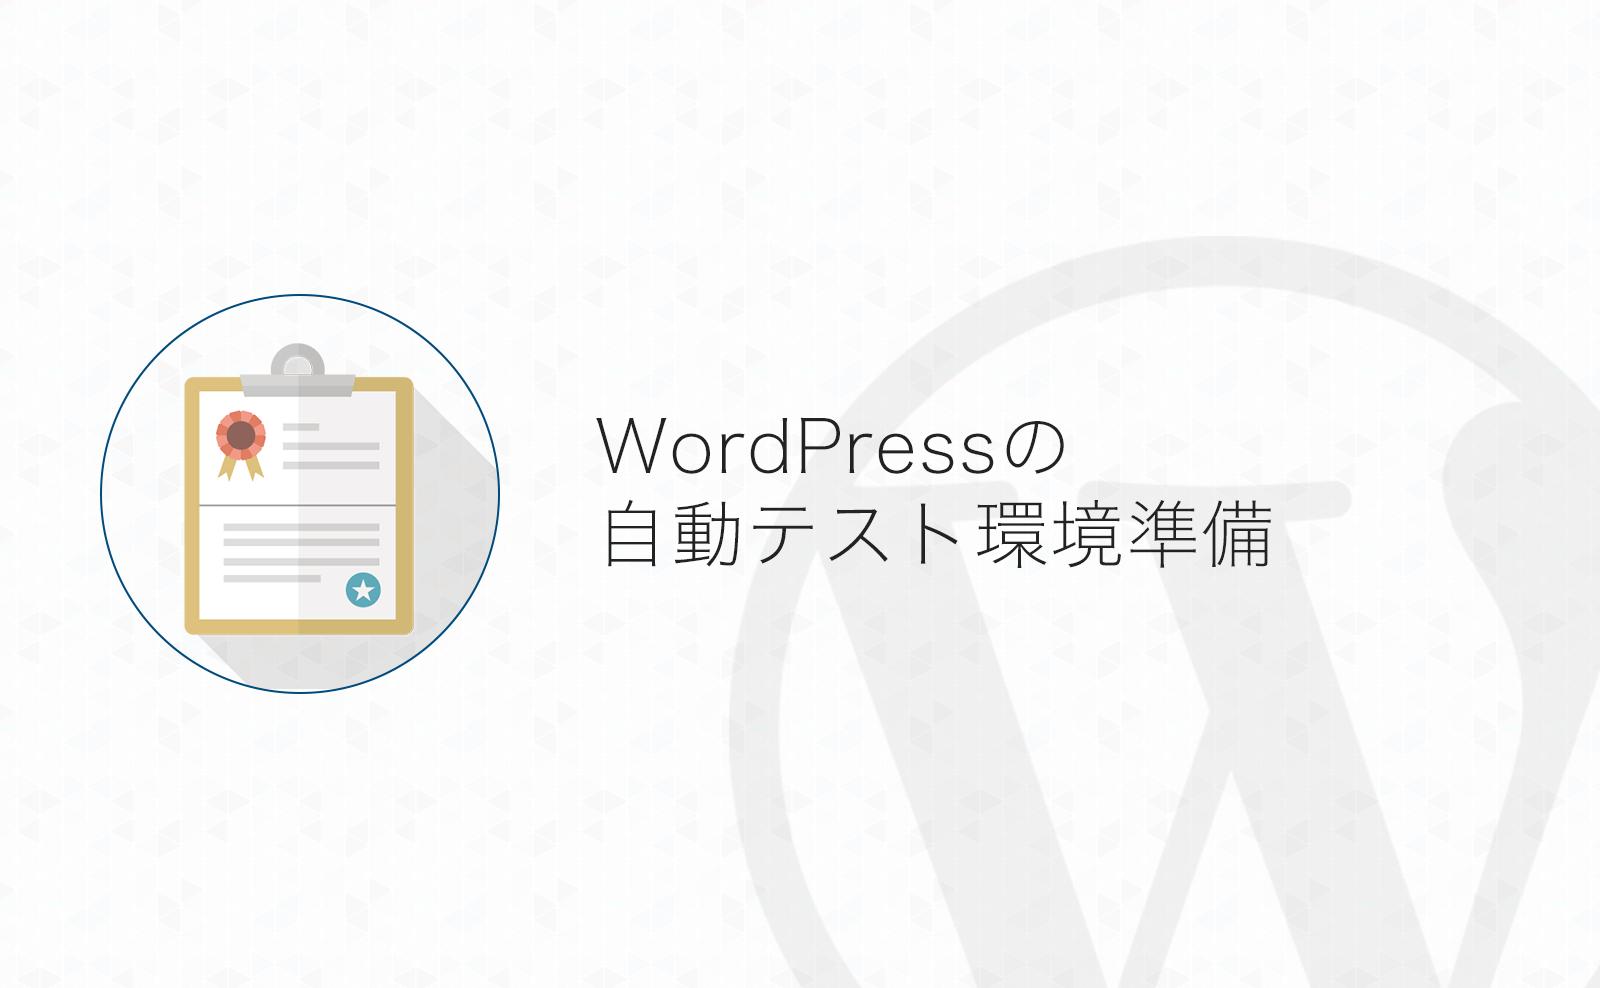 WordPressの自動テストを行う環境を整えるまでの道のり